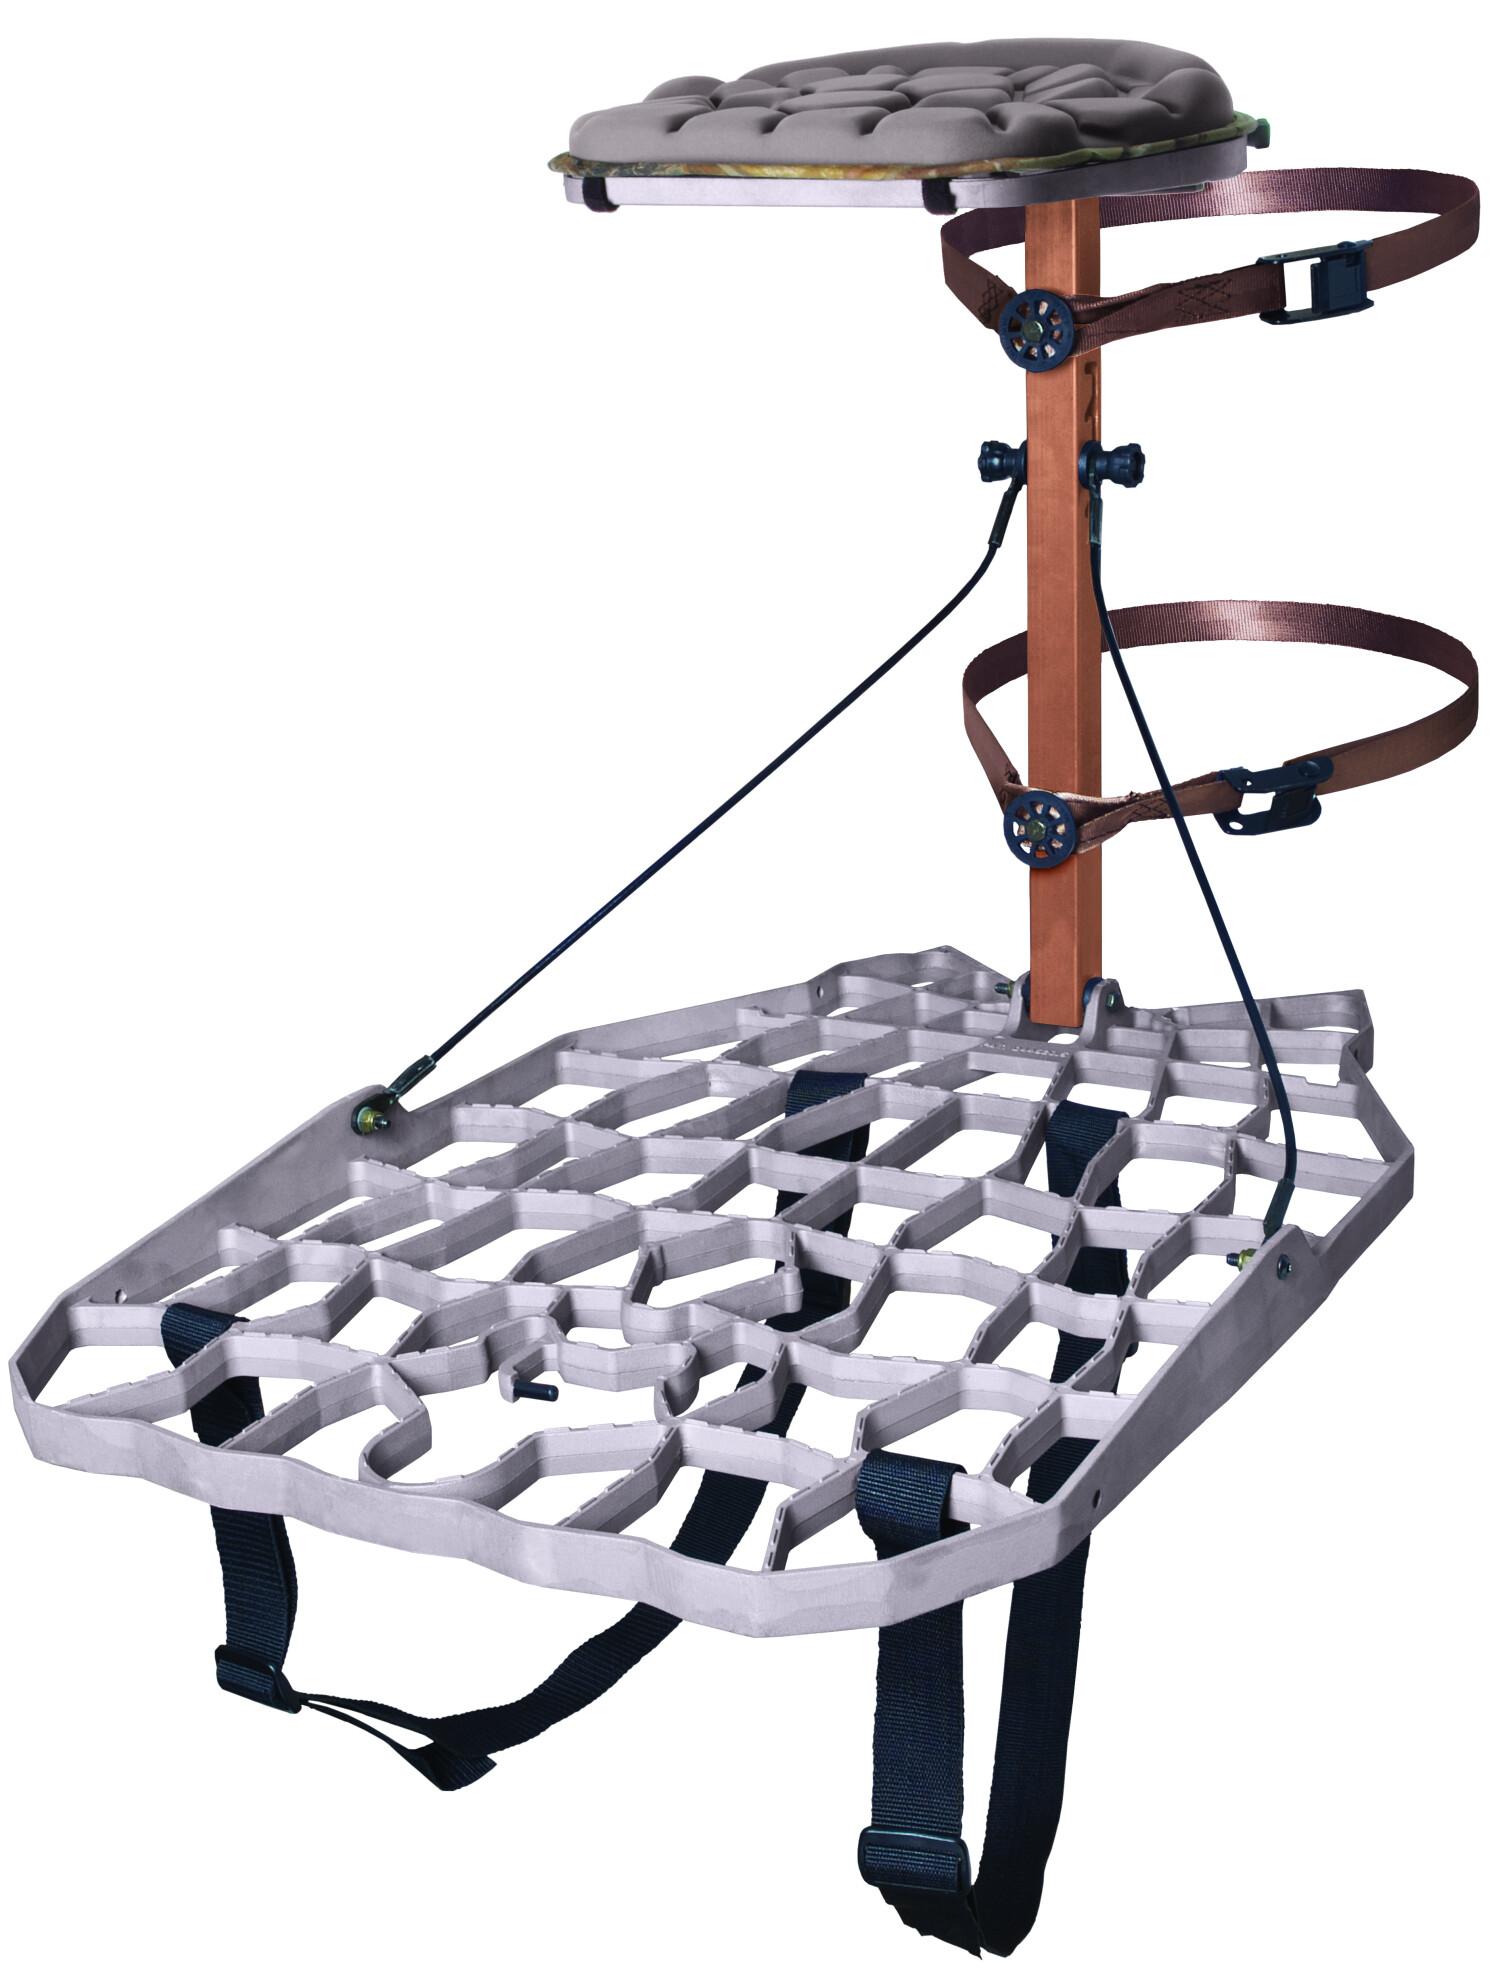 Lone Wolf Treestands Alpha II Hang-On Easy Hang Bracket Accessible, Quiet, Aluminum Platform, Mobile Hunting Outdoor